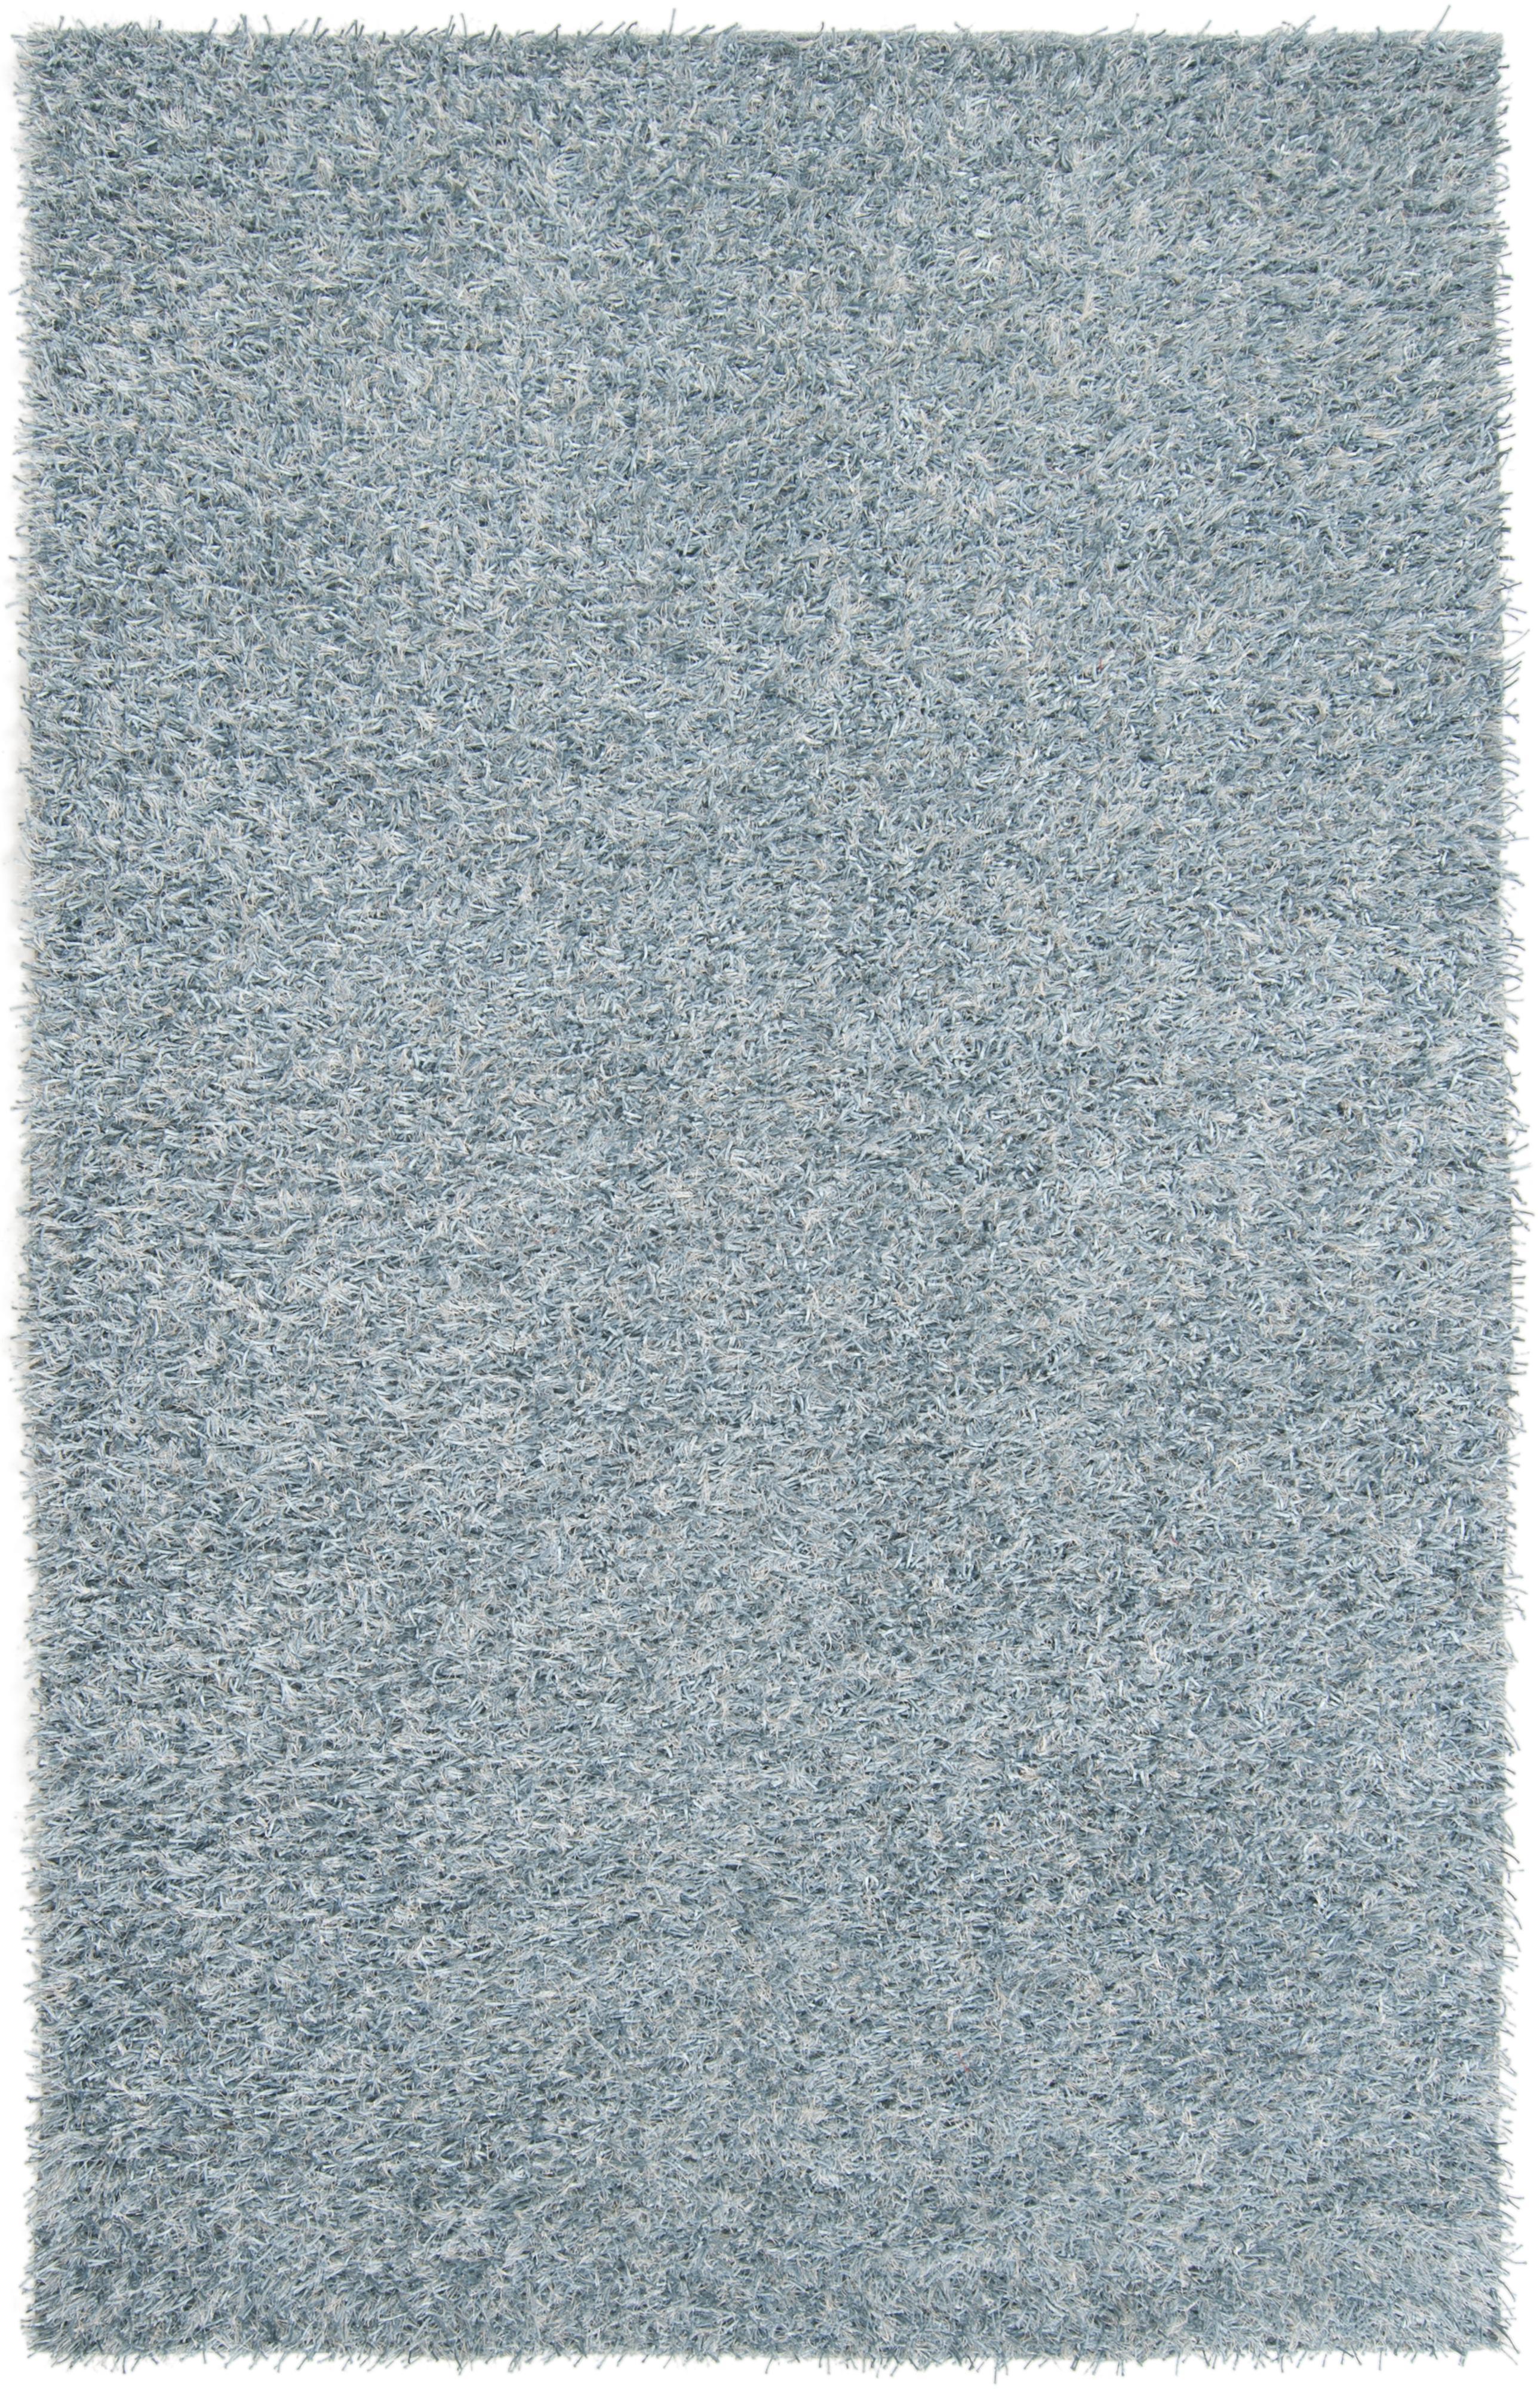 Surya Rugs Taz 8' x 10' - Item Number: TAZ1003-810